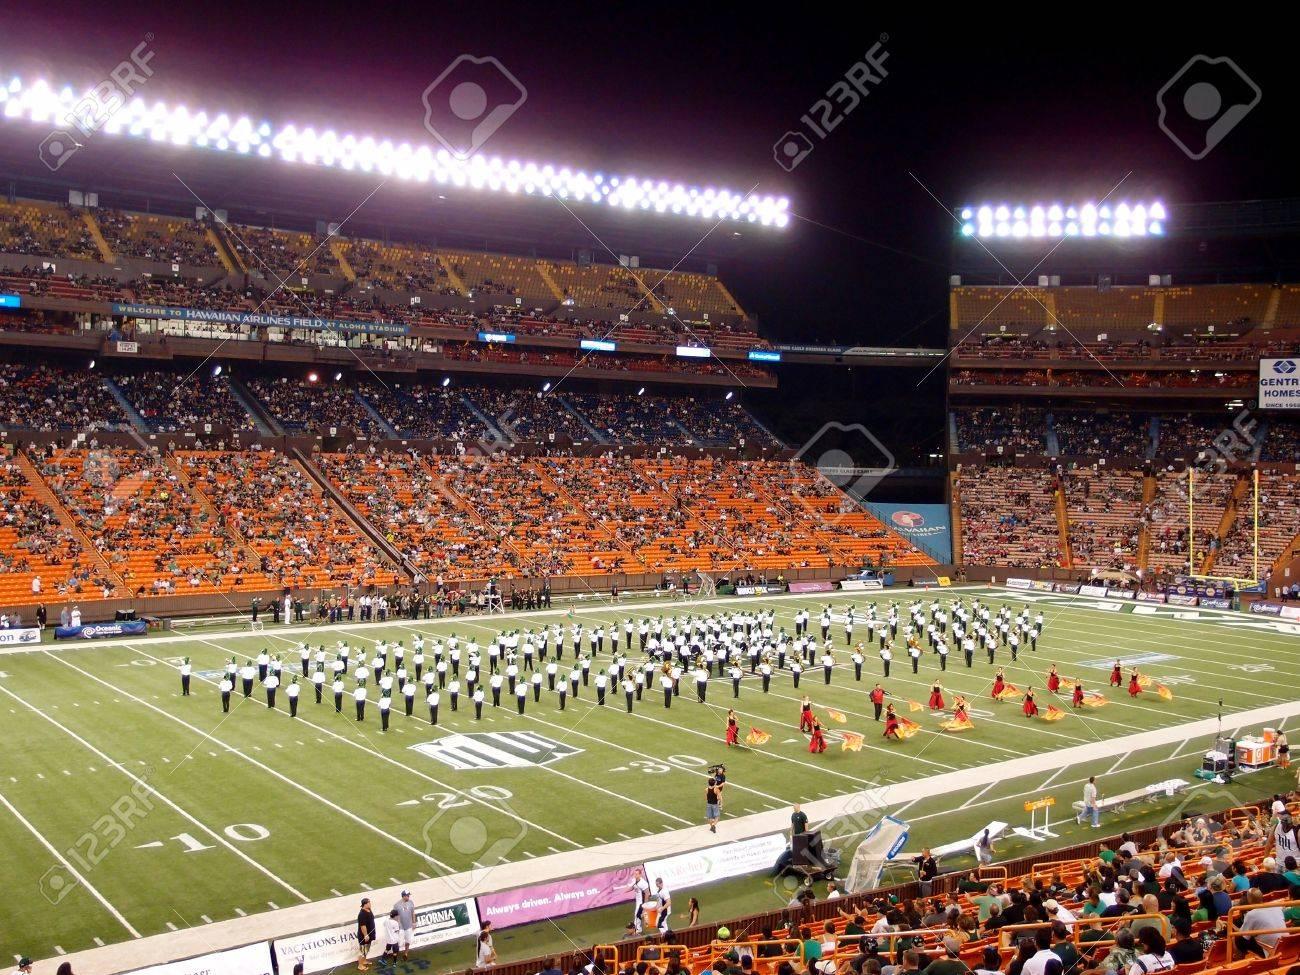 HONOLULU, HI - NOVEMBER 24: Half Time Show during Football game at Aloha Stadium November 24, 2012 on Oahu, Hawaii. Stock Photo - 18306254